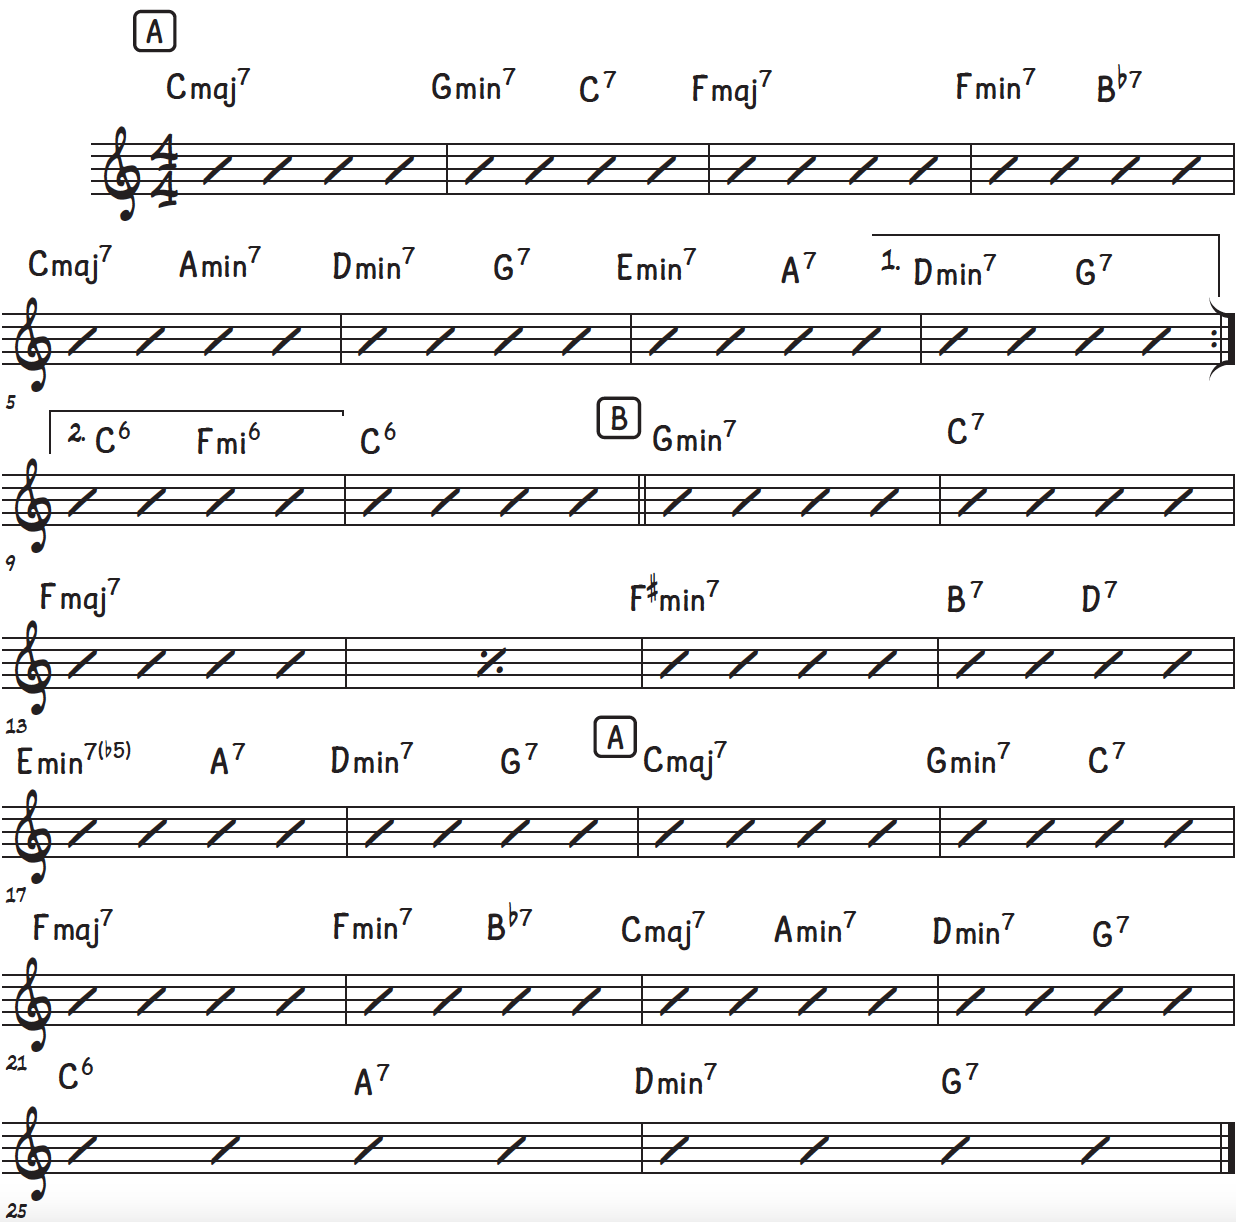 The chords to the jazz ballad Misty by Erroll Garner